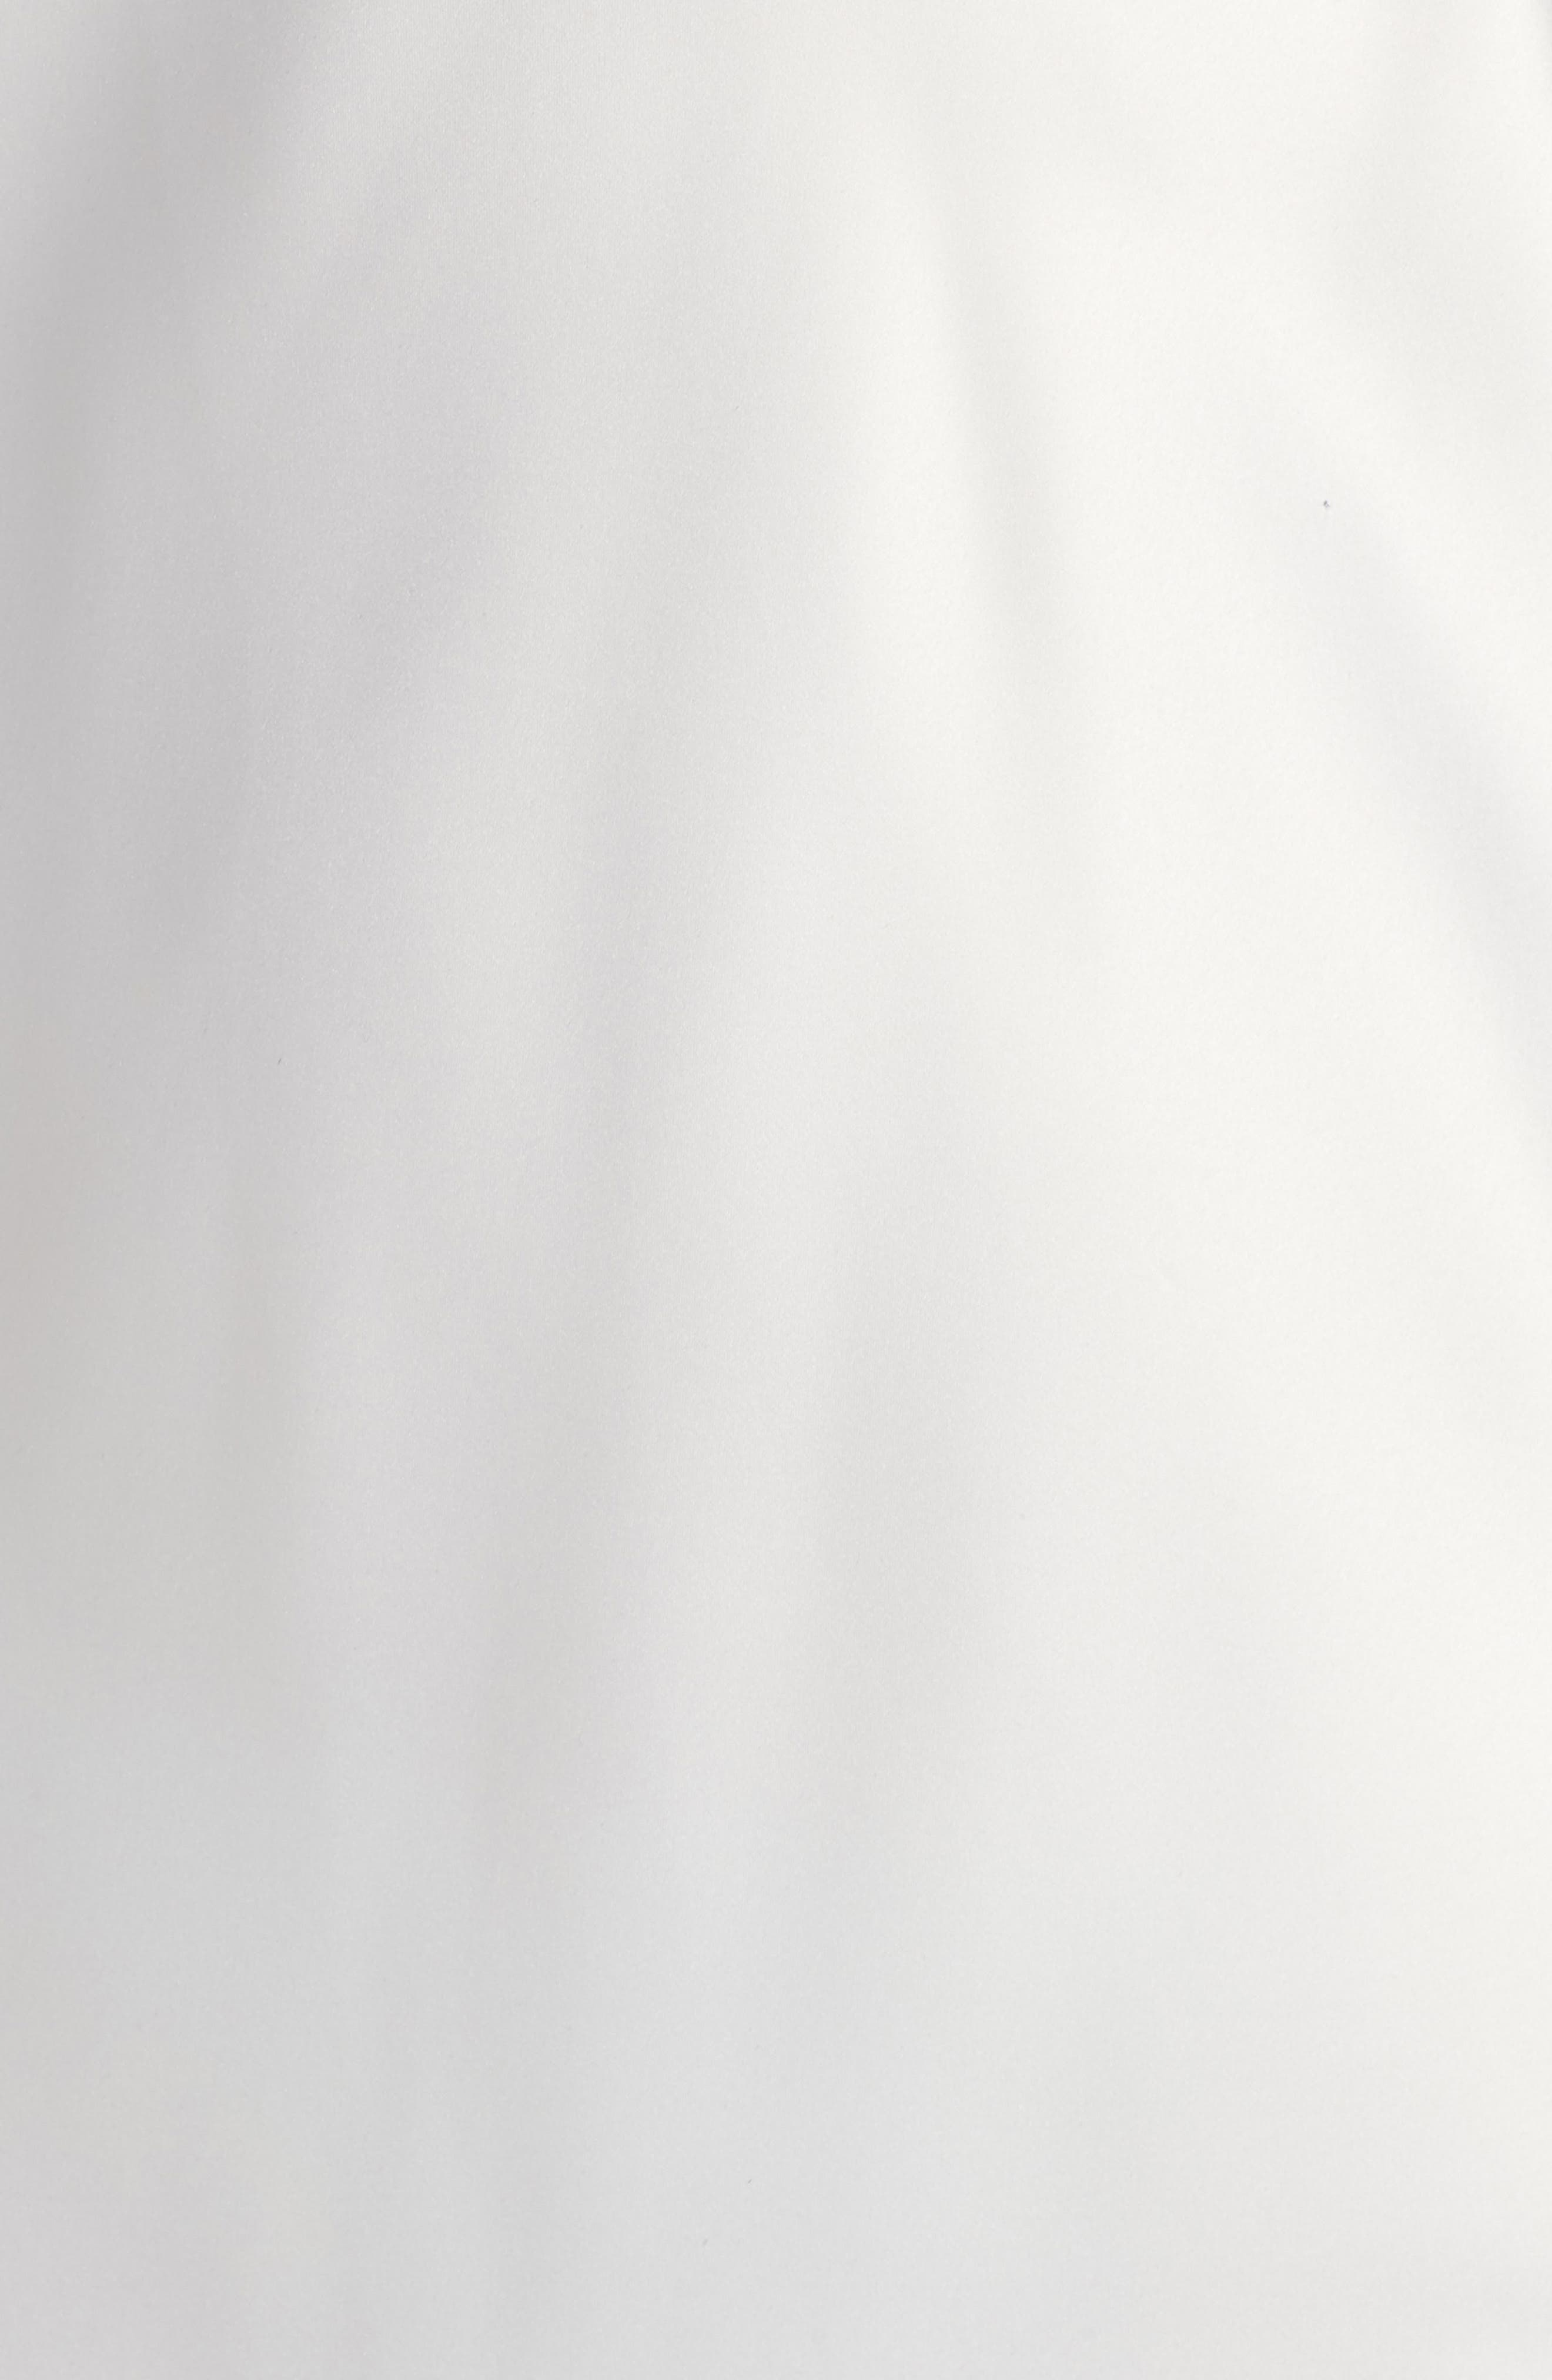 NATORI, Feather Lace Trim Chemise, Alternate thumbnail 5, color, WARM WHITE